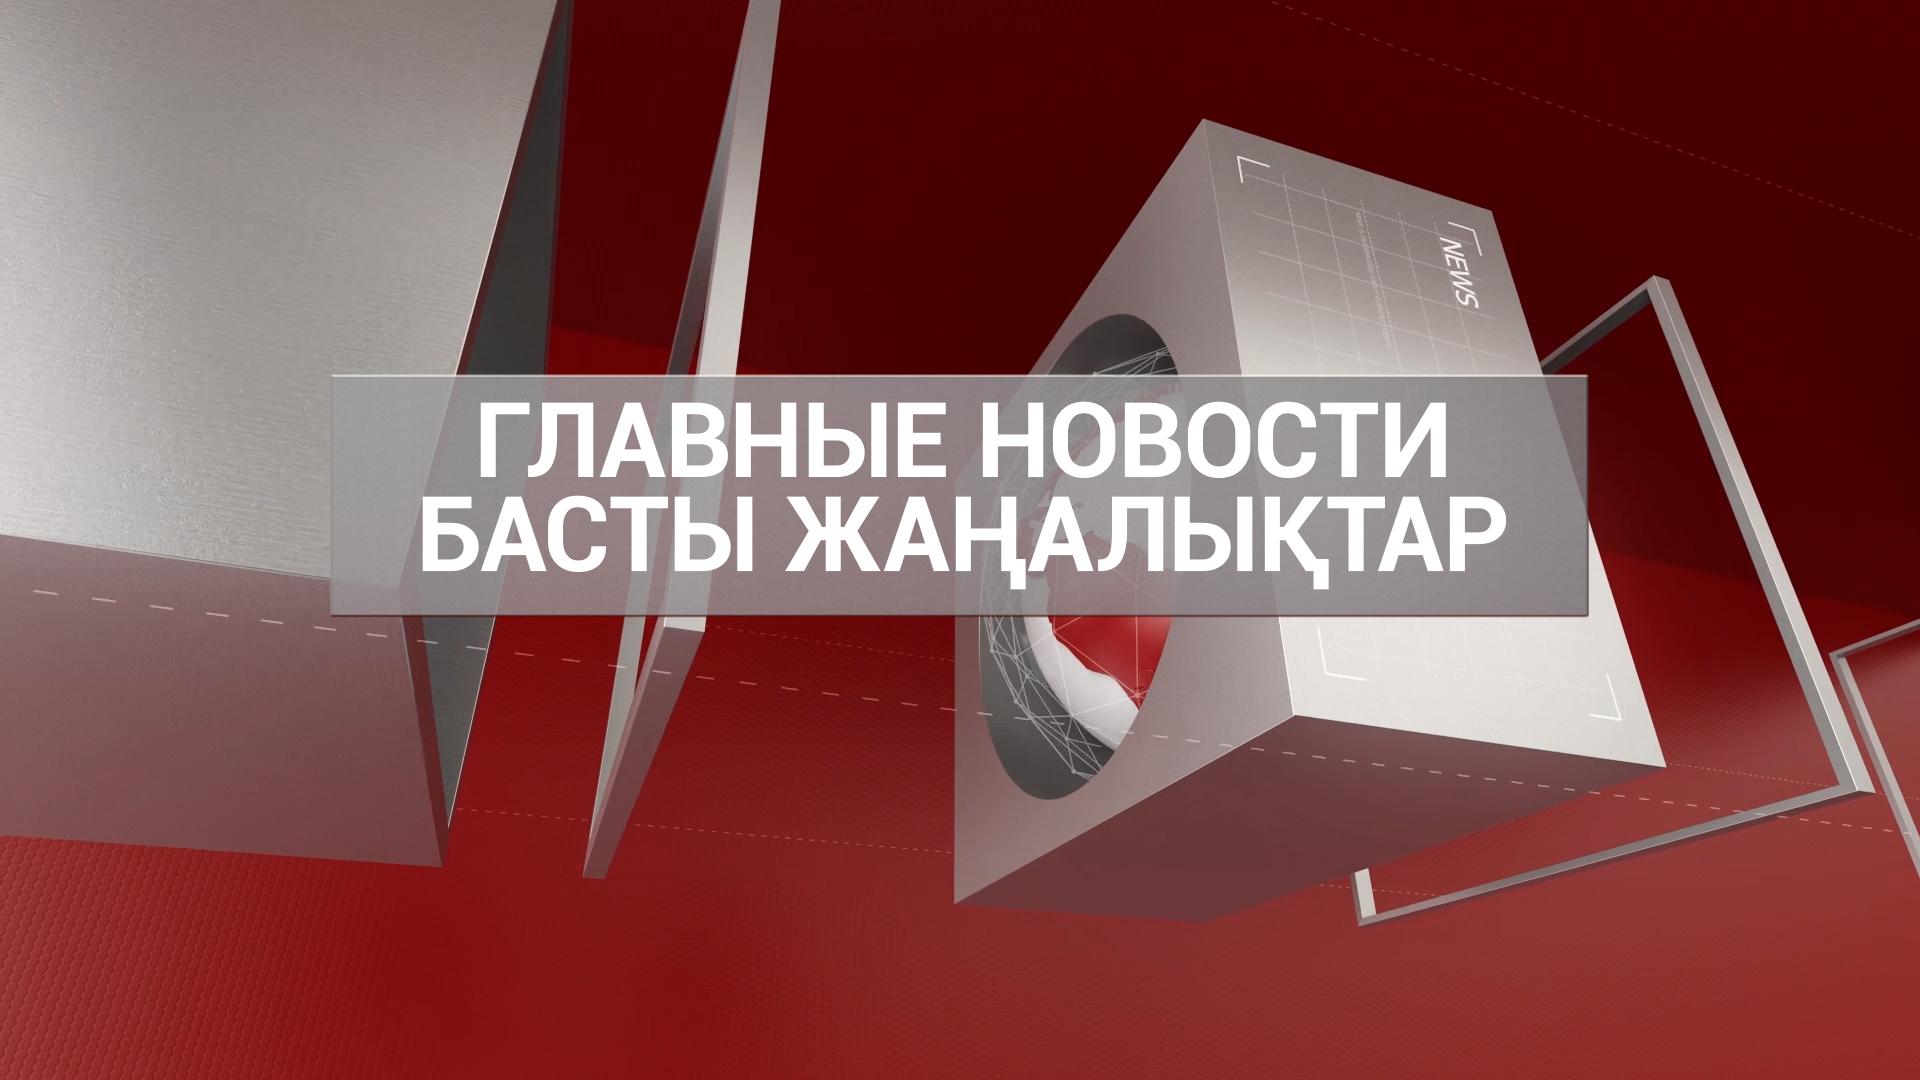 https://inbusiness.kz/ru/images/programbig/25/images/lsYZ3ARj.jpg